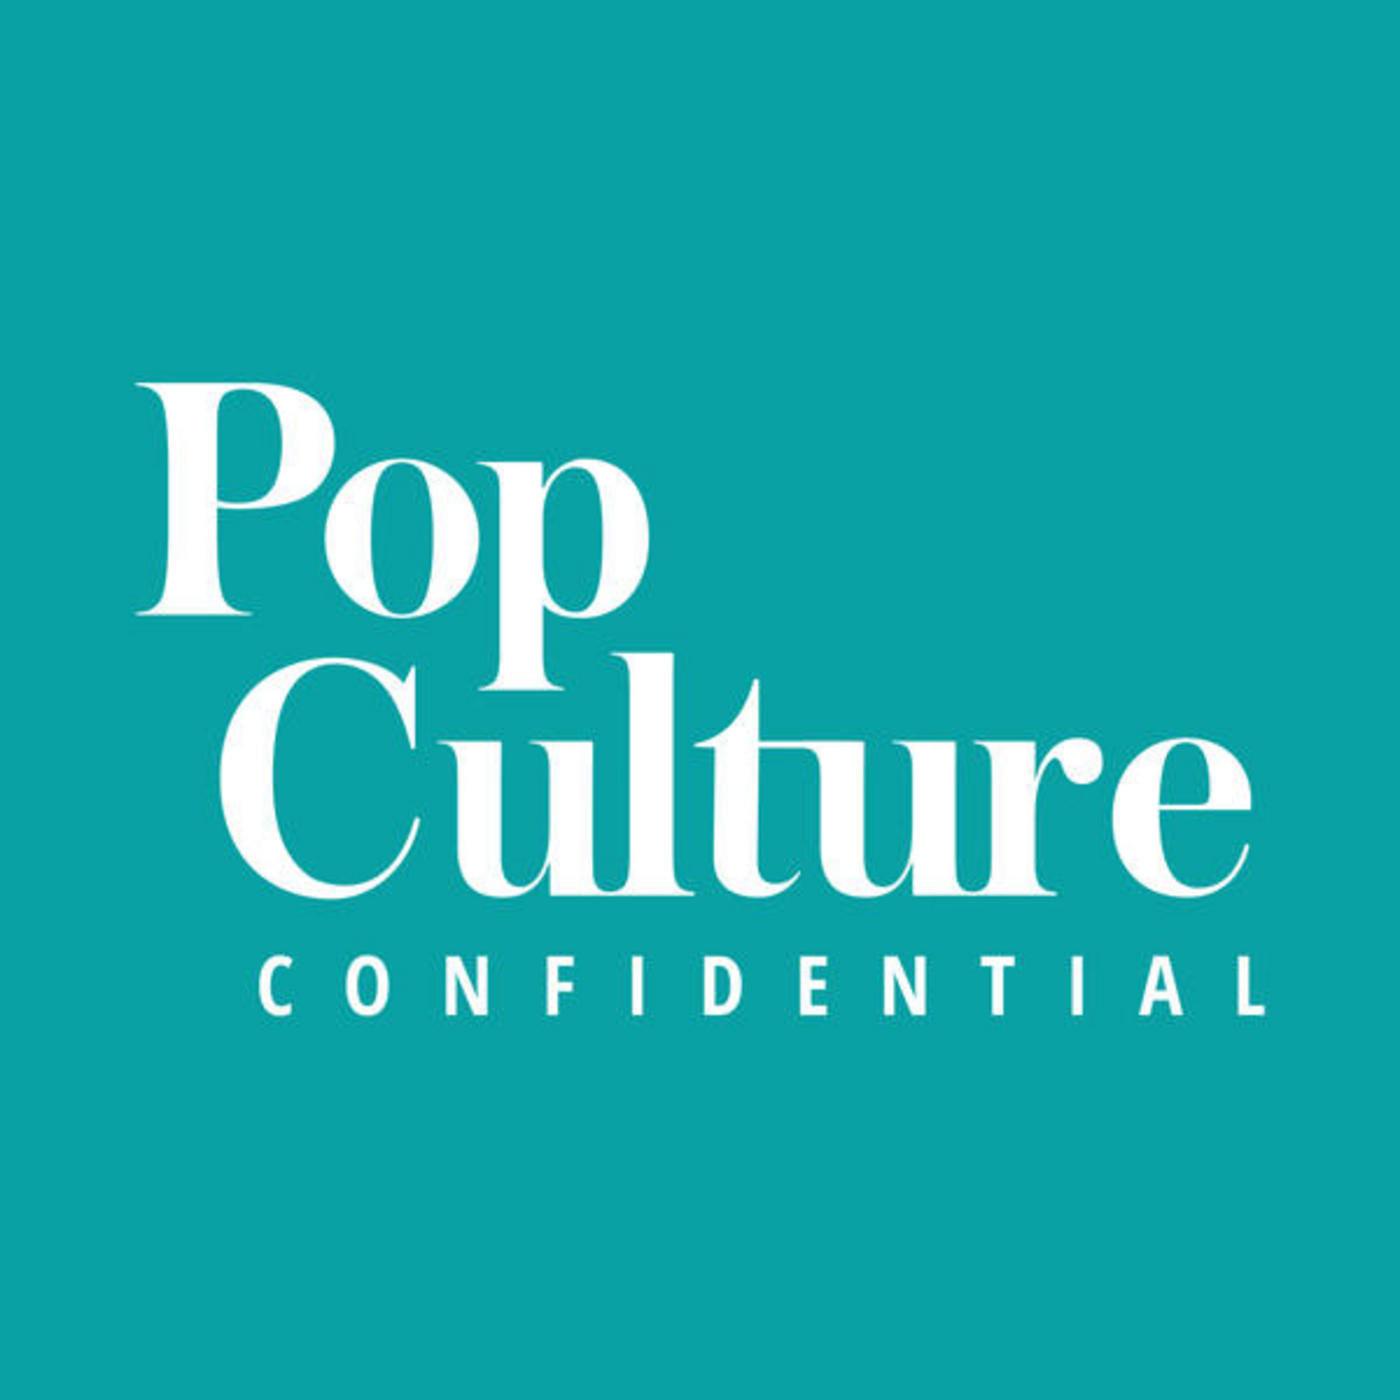 Episode 10: Goodfellas to Forrest Gump - Legendary Casting by Ellen Lewis